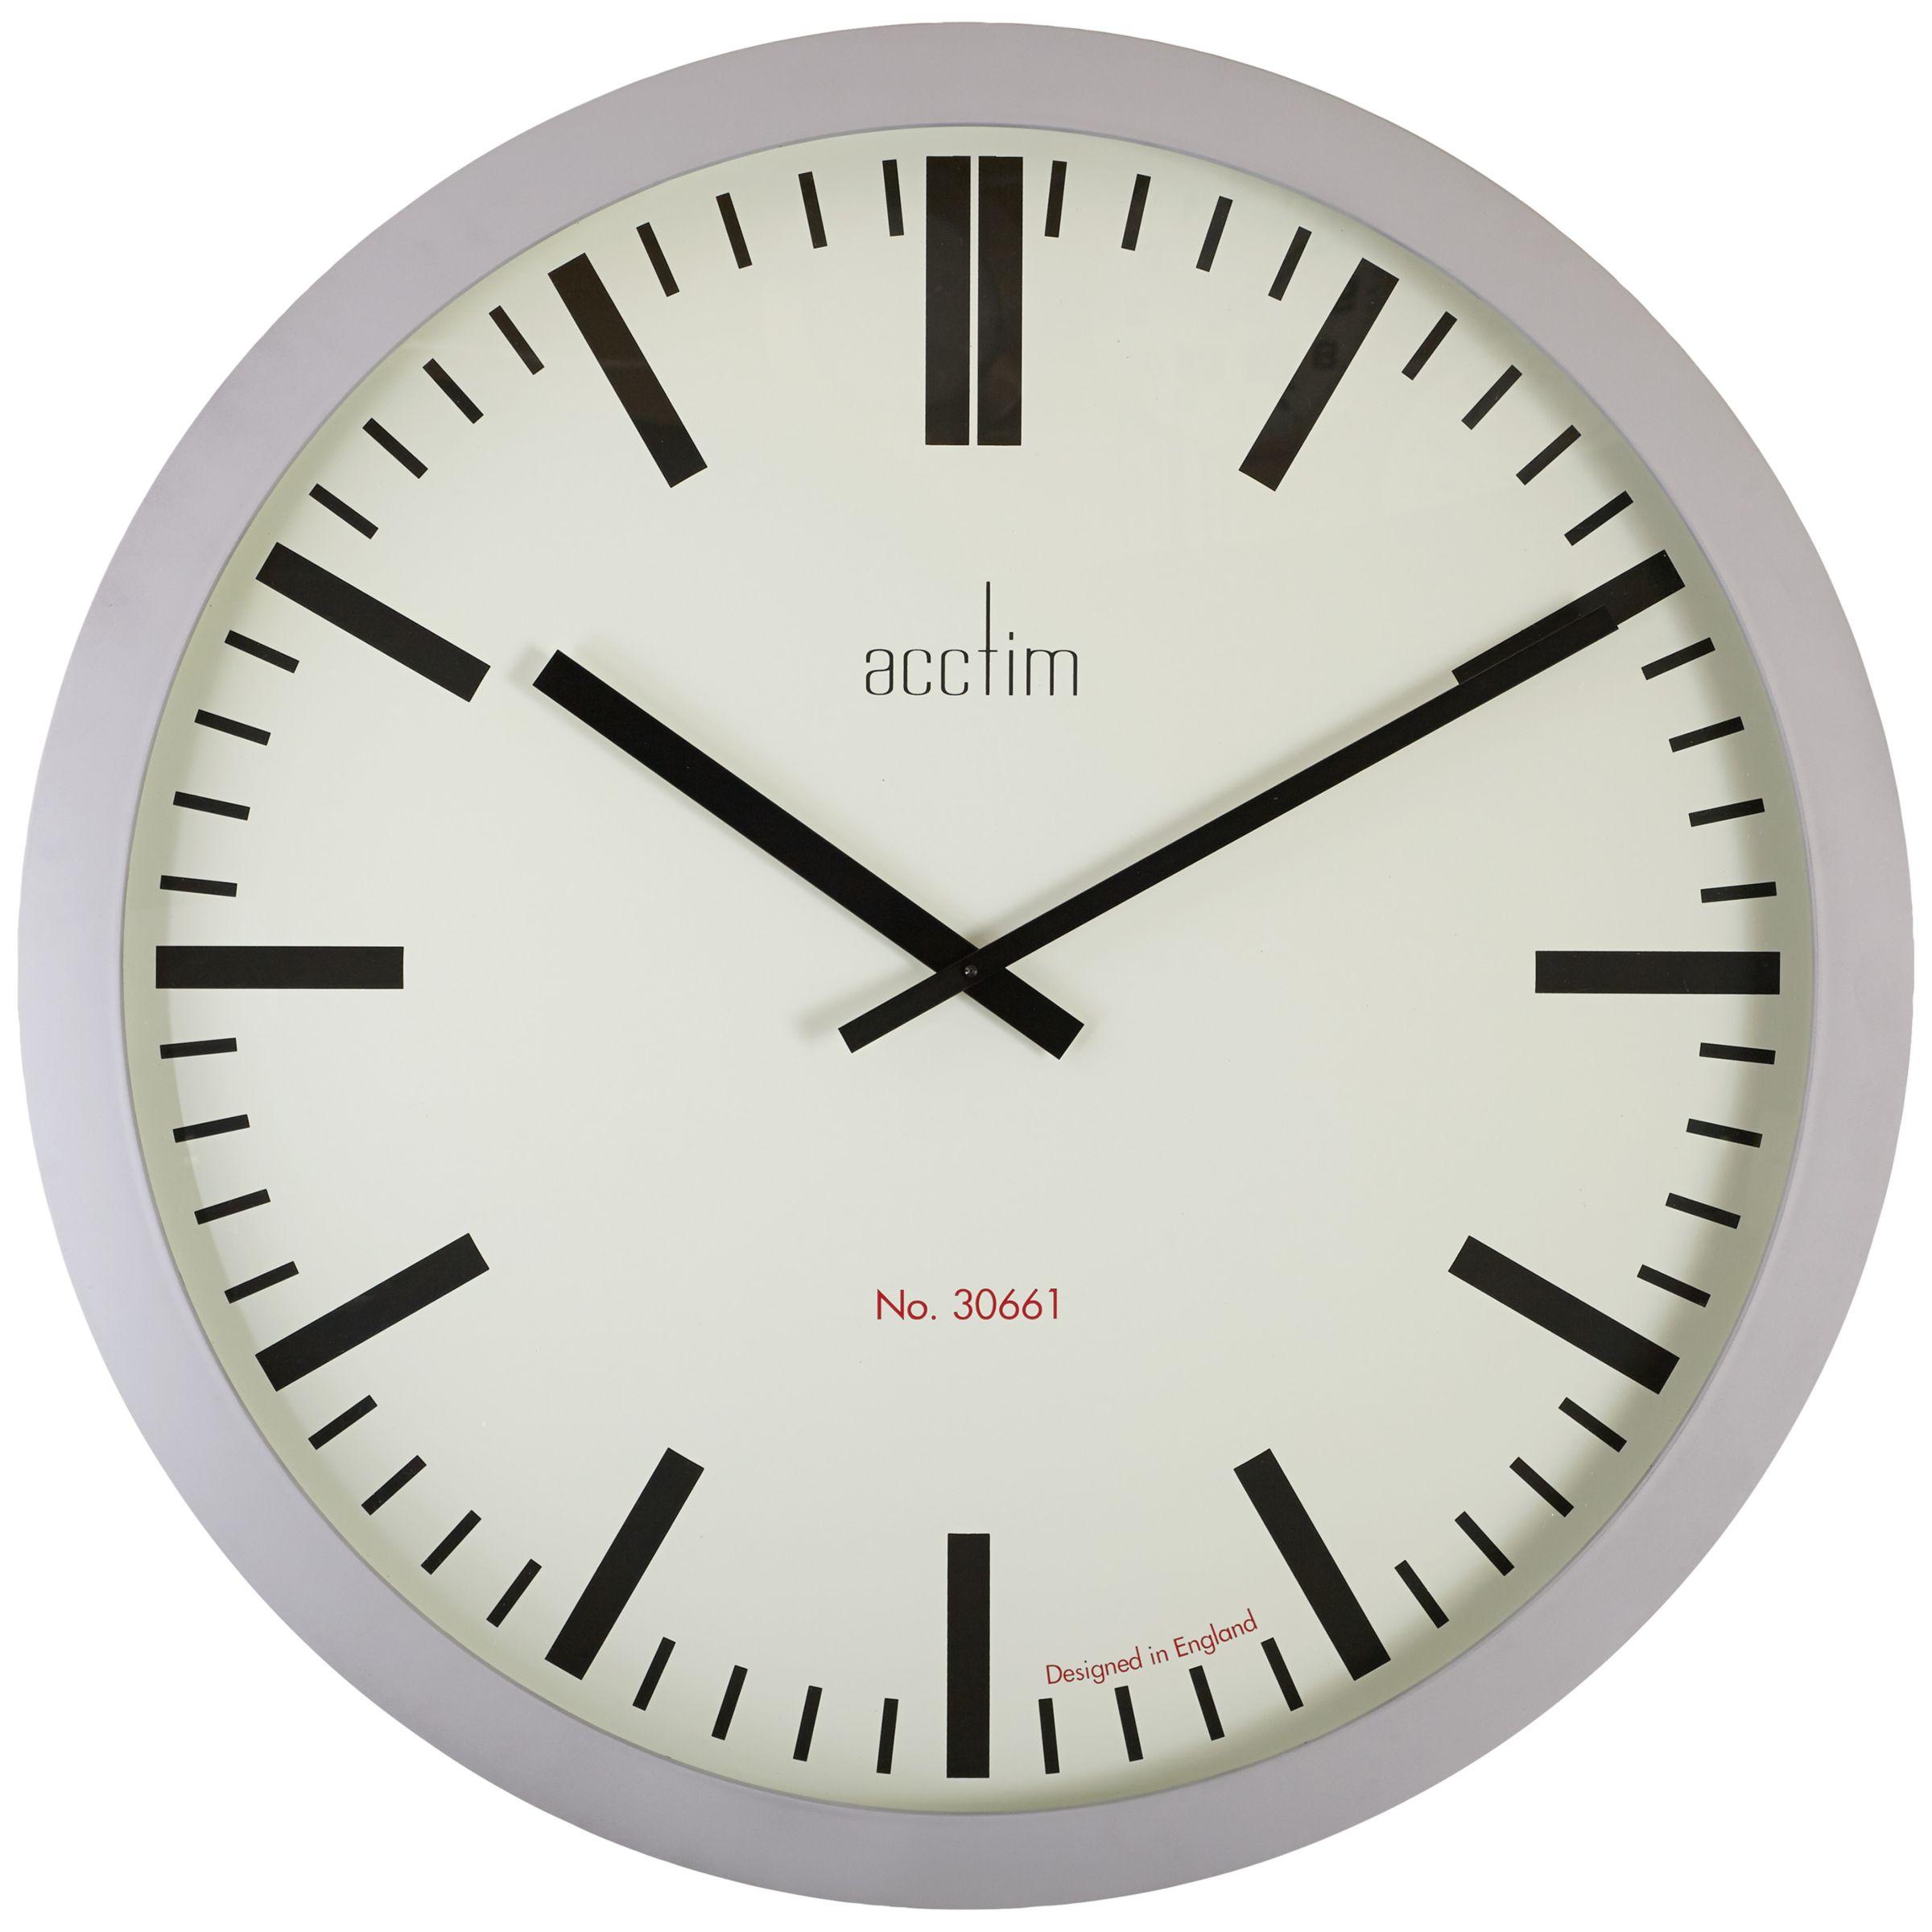 Acctim Acctim Monument Wall Clock, Grey